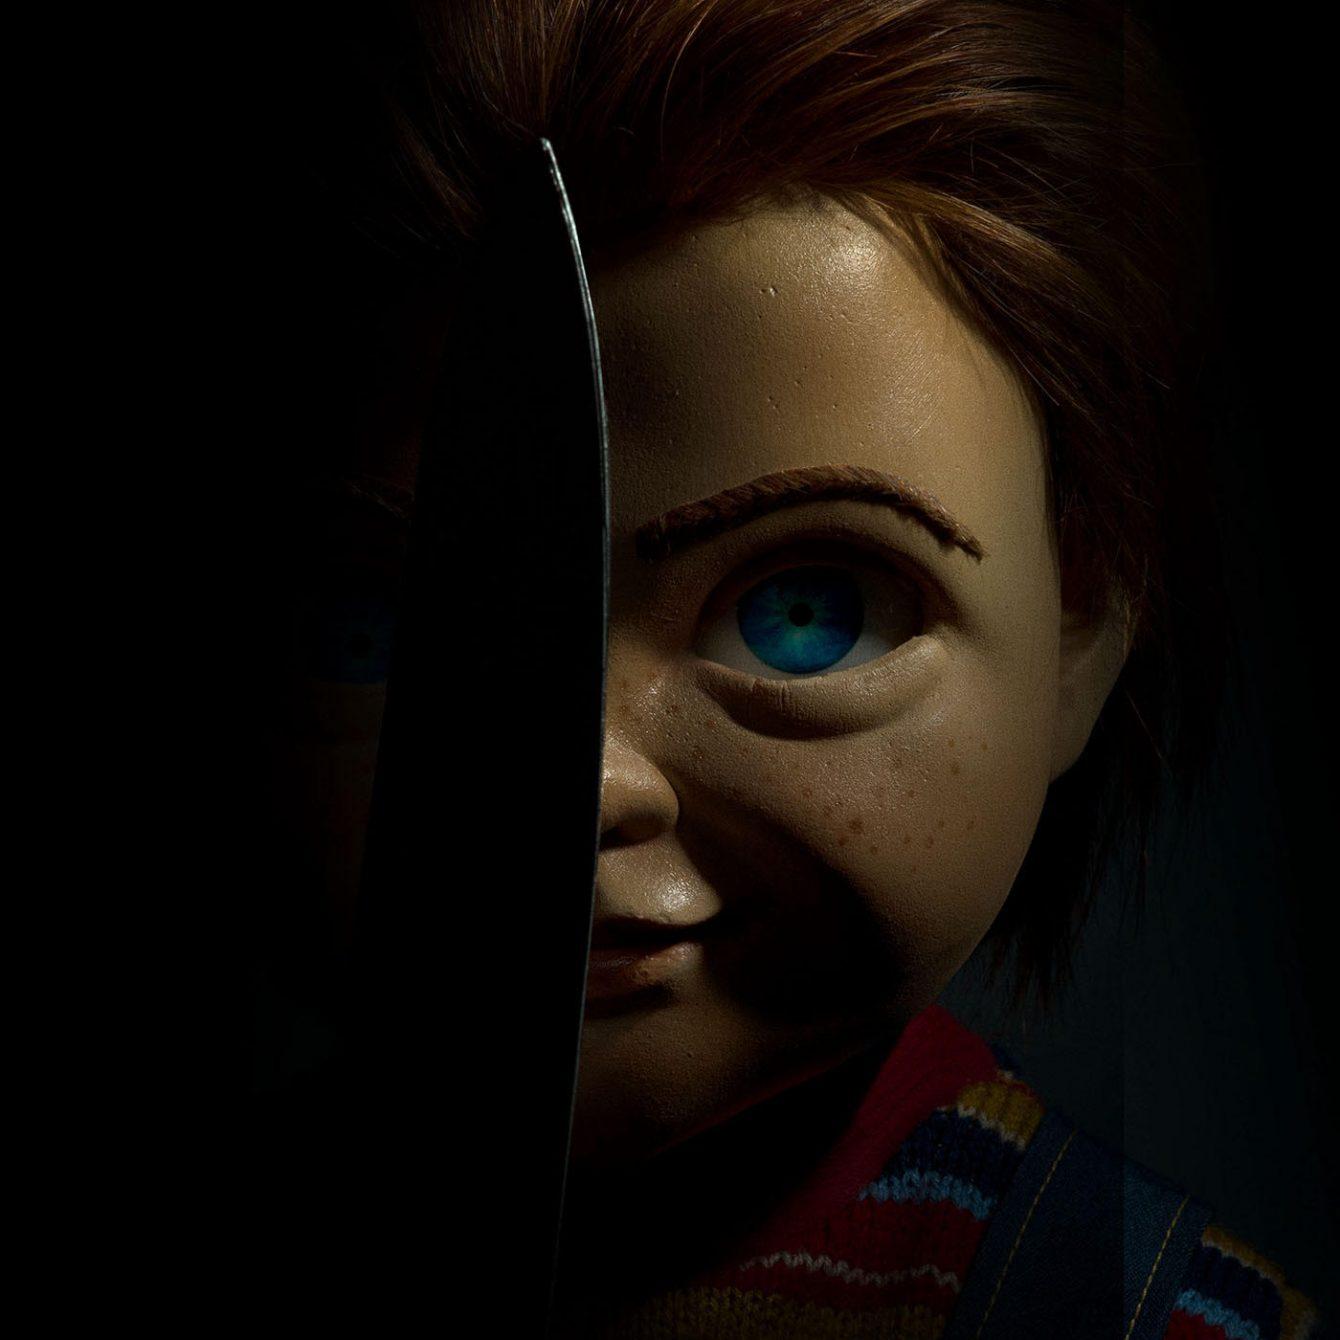 Chucky Child's Play Reboot